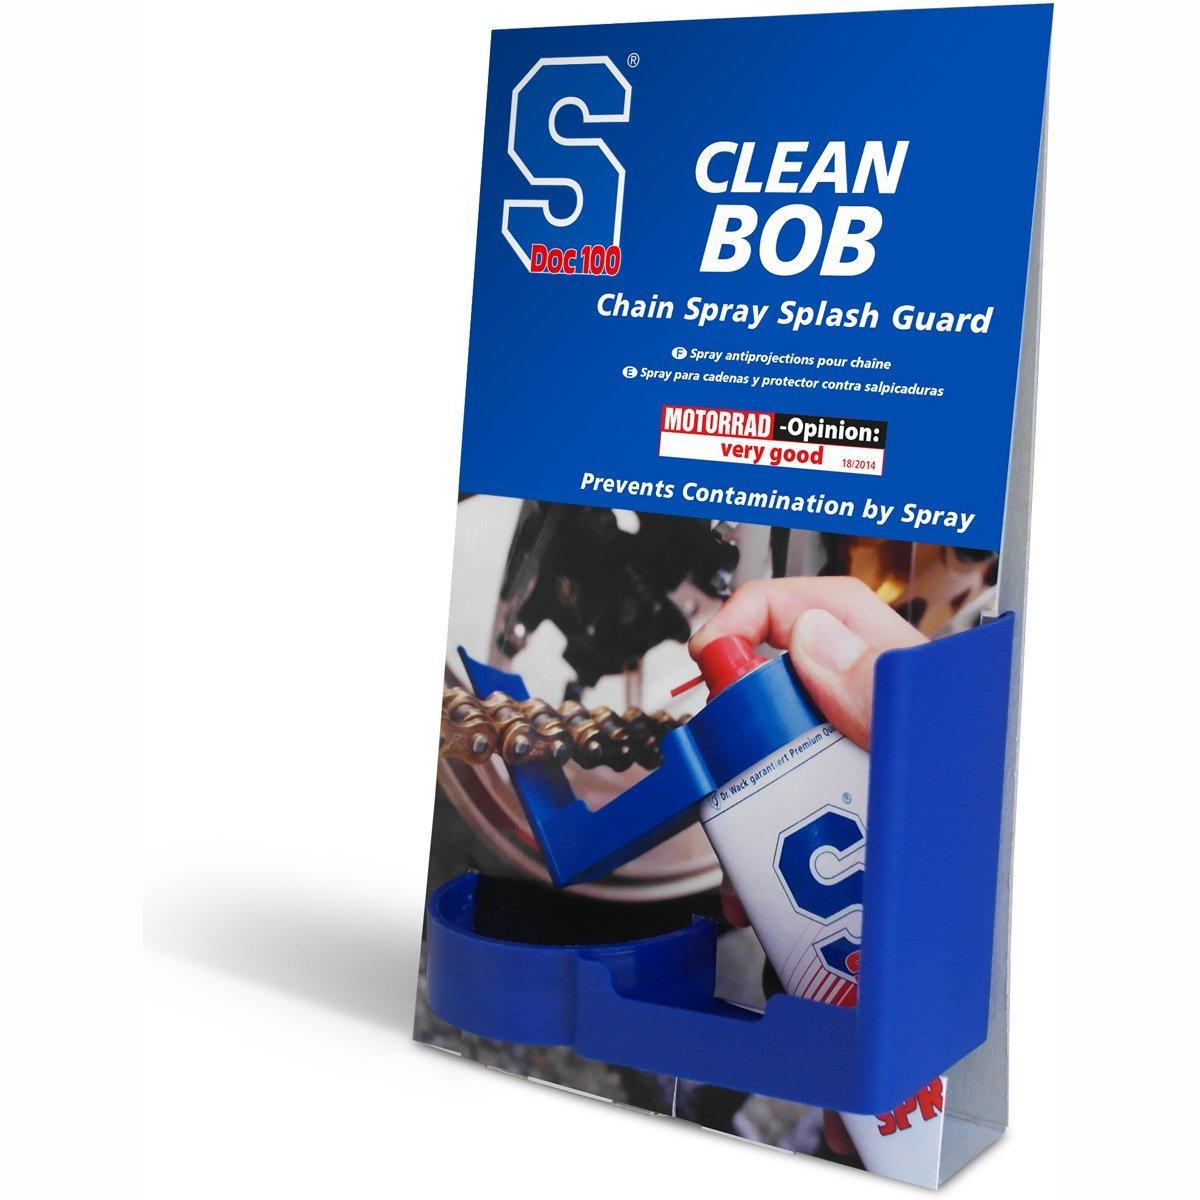 Motorcycle SDoc S100 Motorcycle Chain Spray Guard BOB - Blue SDoc100 Motorcycle Care 4006539080250